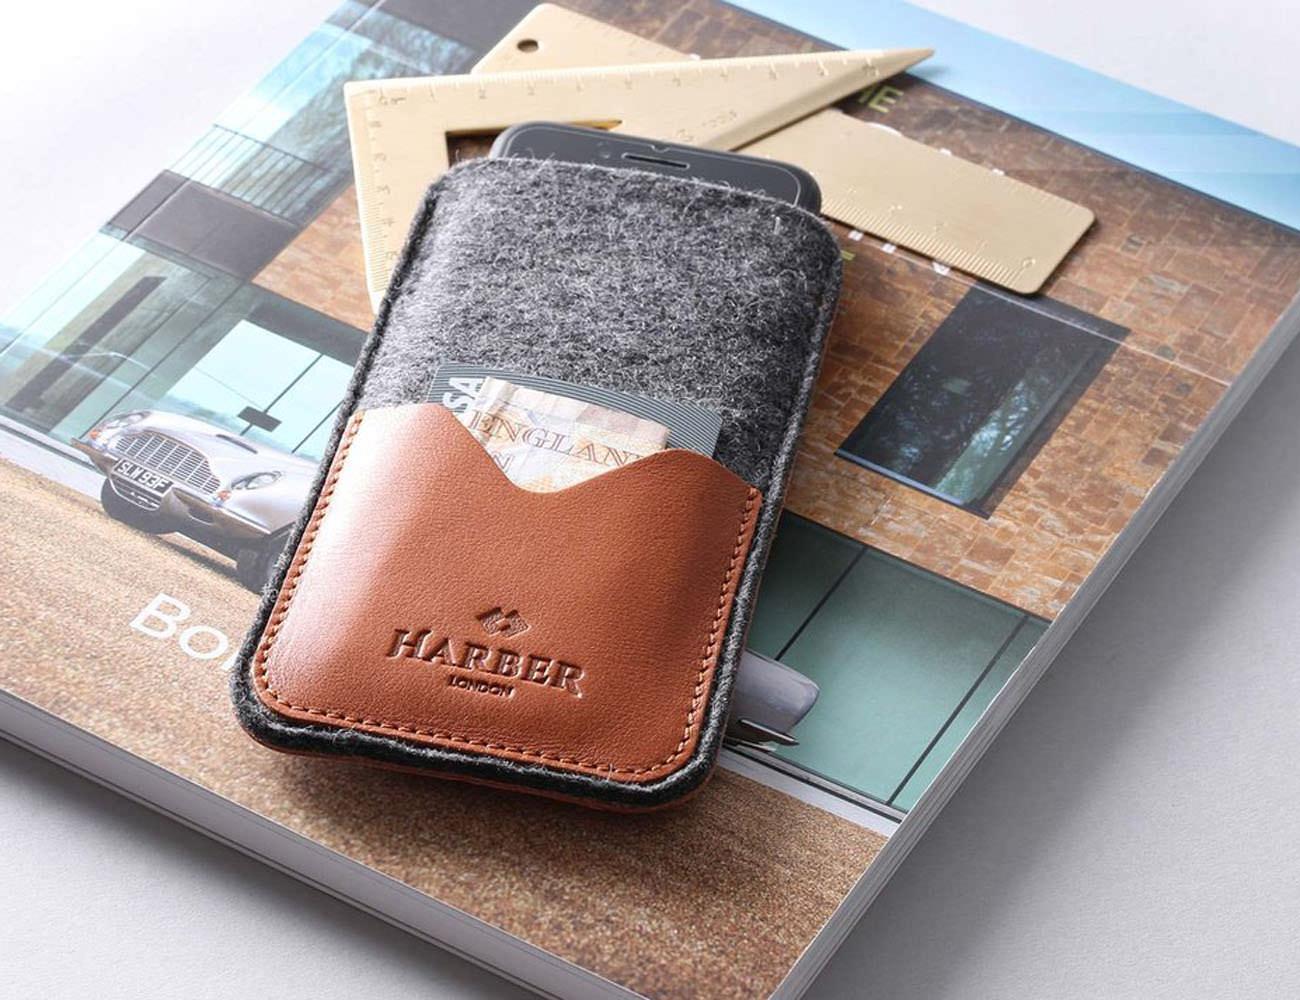 Harber London Leather Smartphone Sleeve Wallet